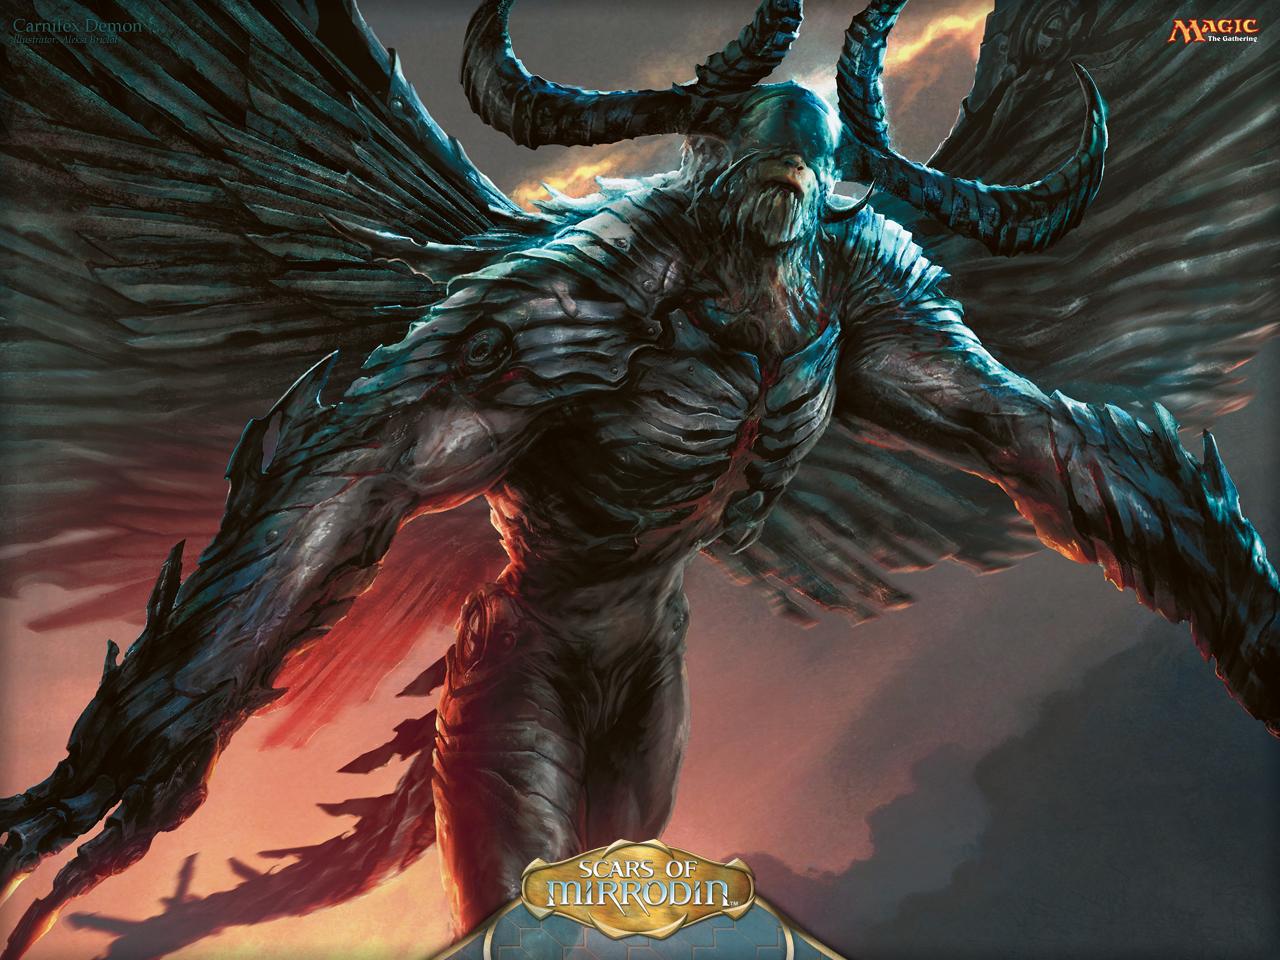 desecration demon wallpaper - photo #14